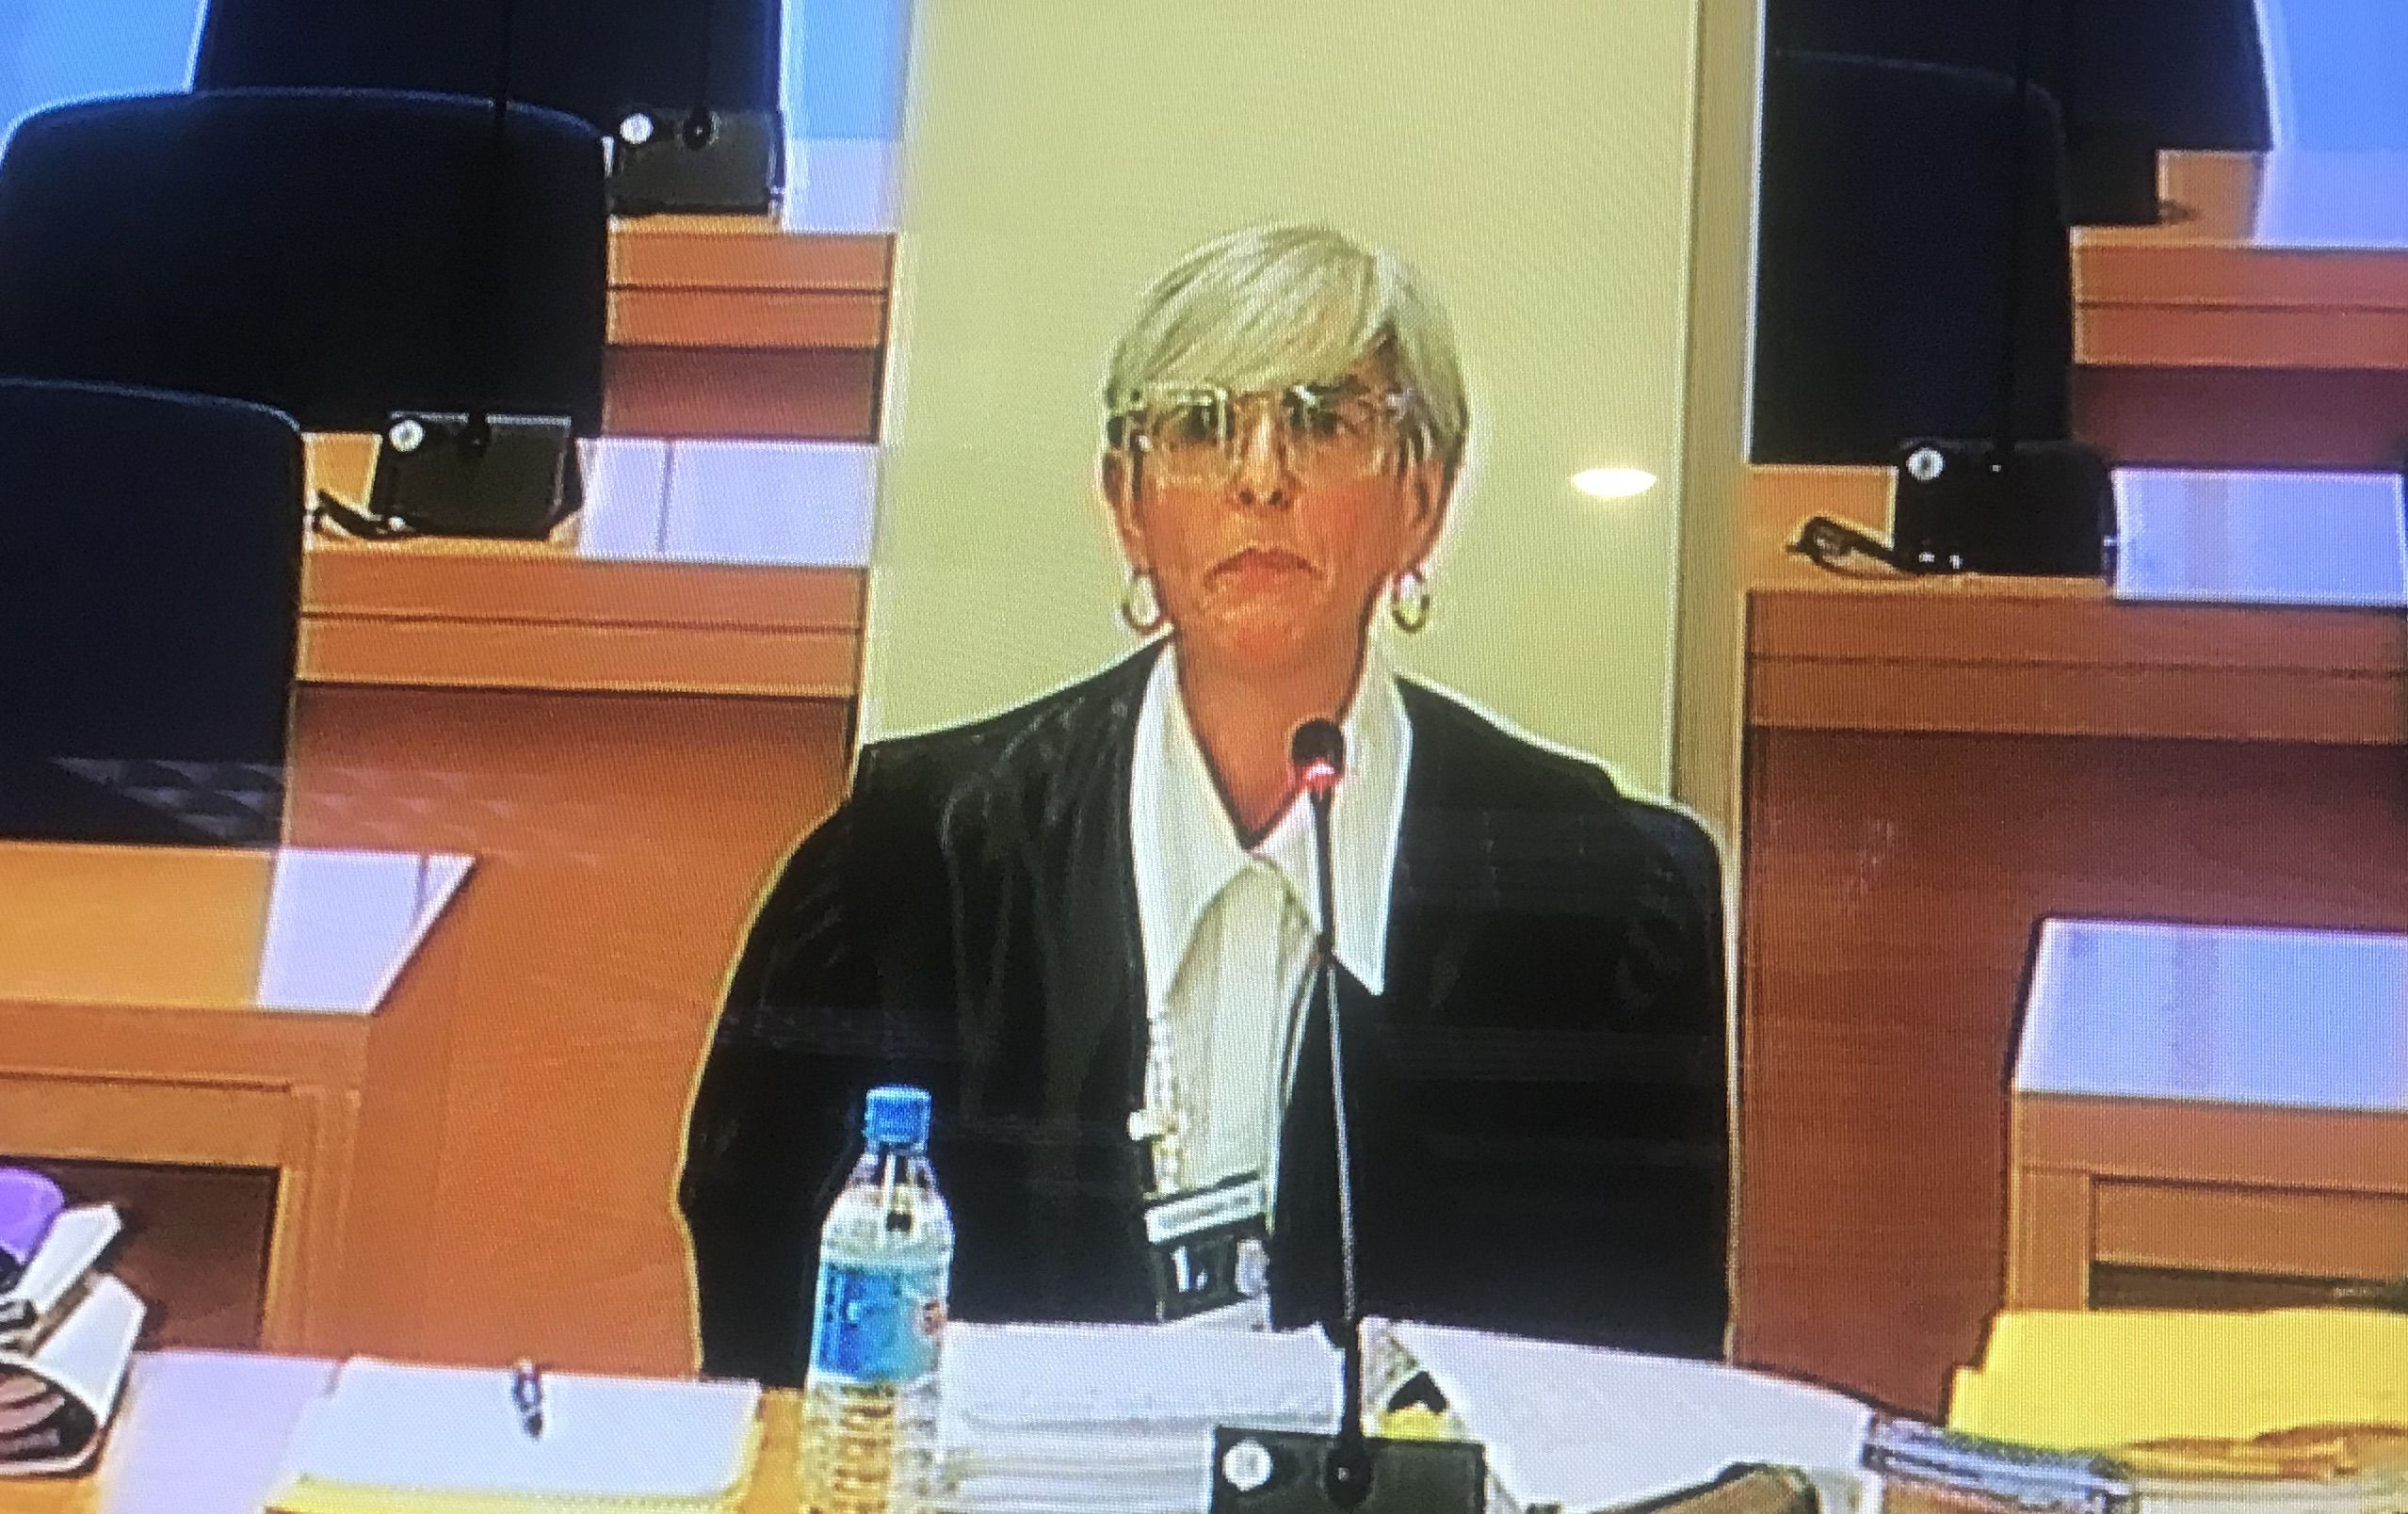 Olga Tubau durant les qüestions prèvies